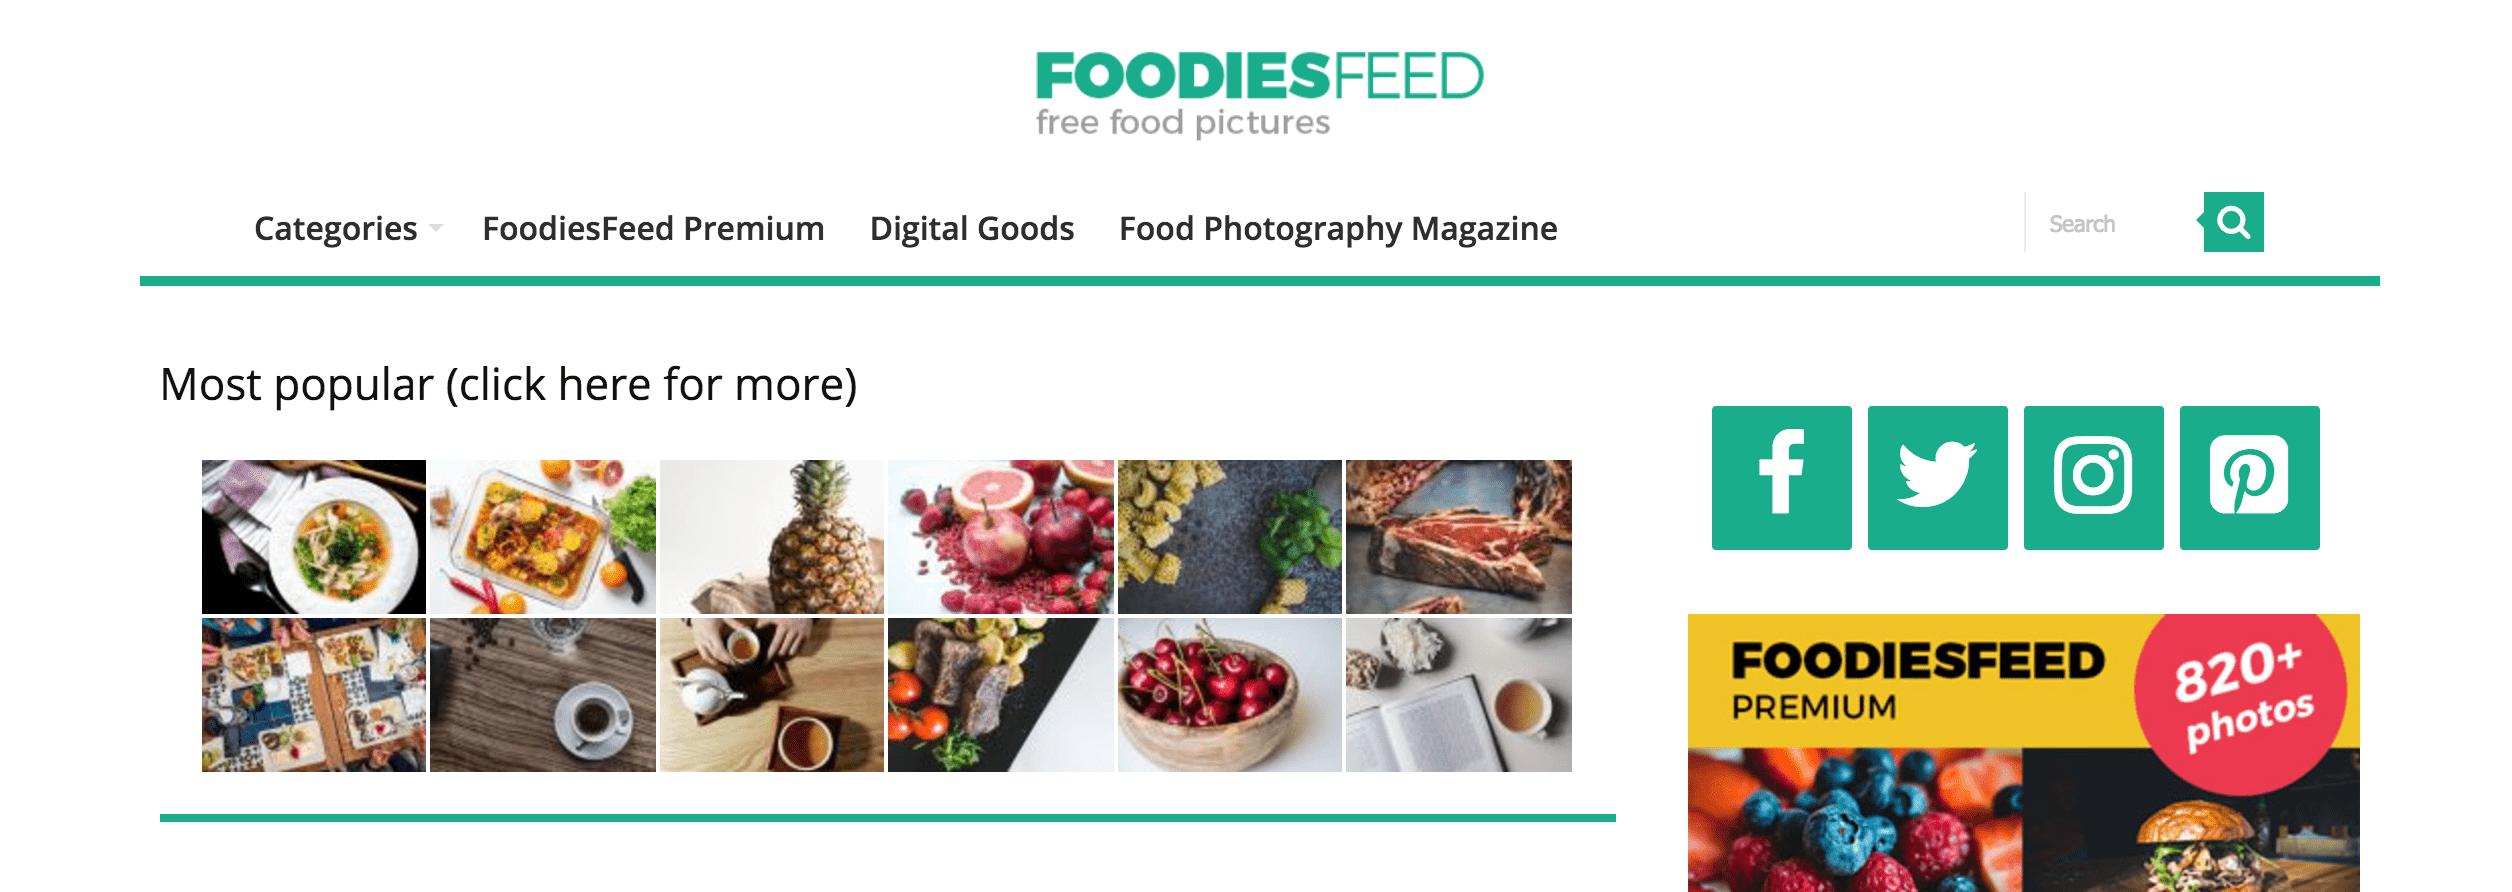 foodiesfeed free images